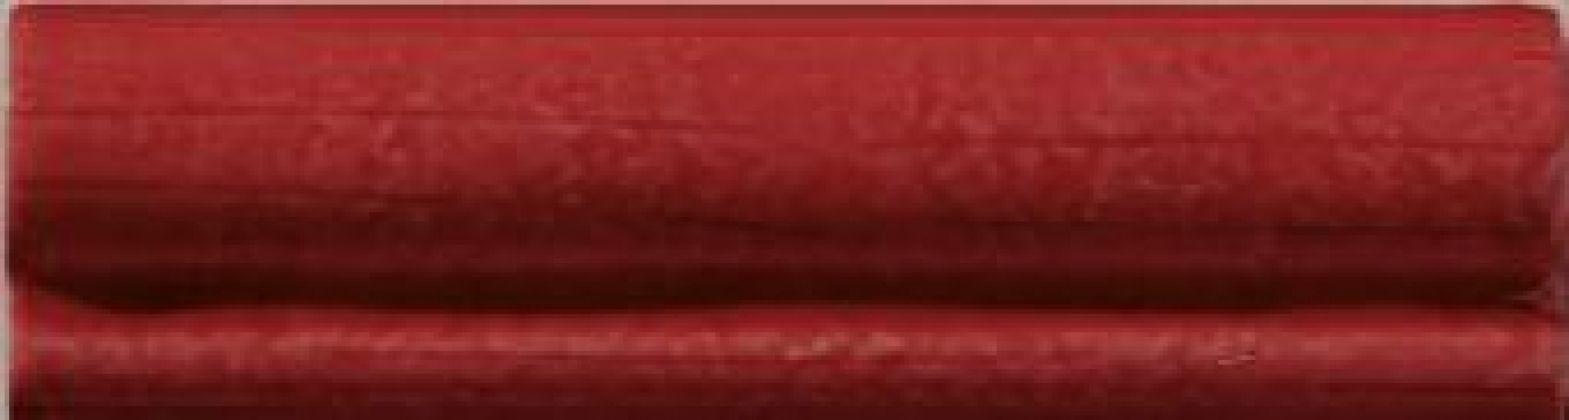 MOLDURA CHIC CARMIN 4x15